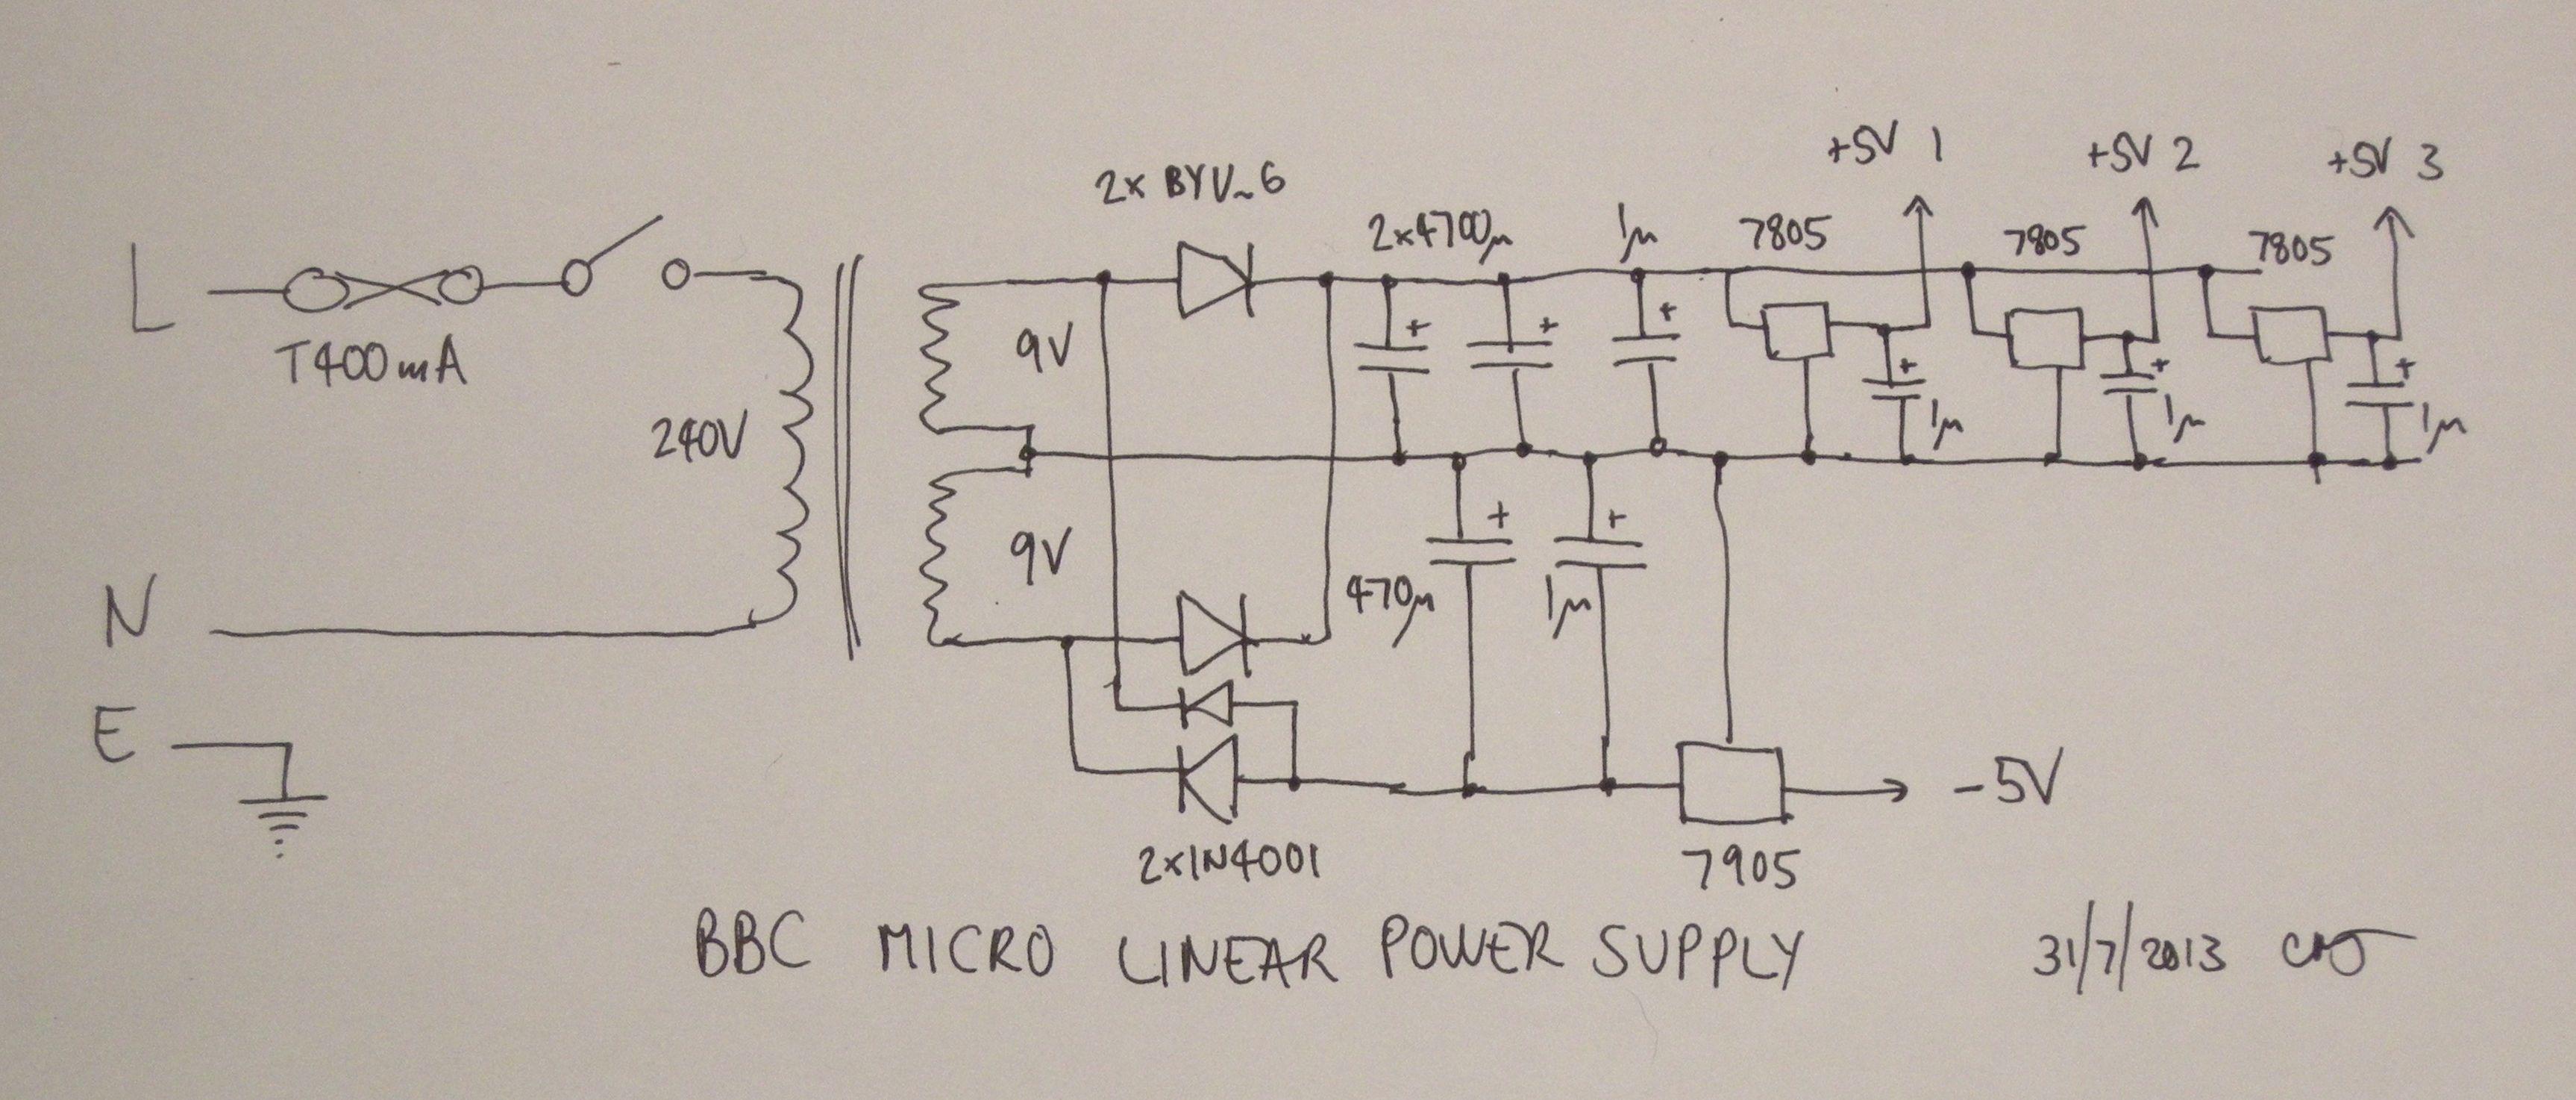 The Bbc Micro Linear Power Supply Martinjonestechnology Wiring Diagram Dscn8952